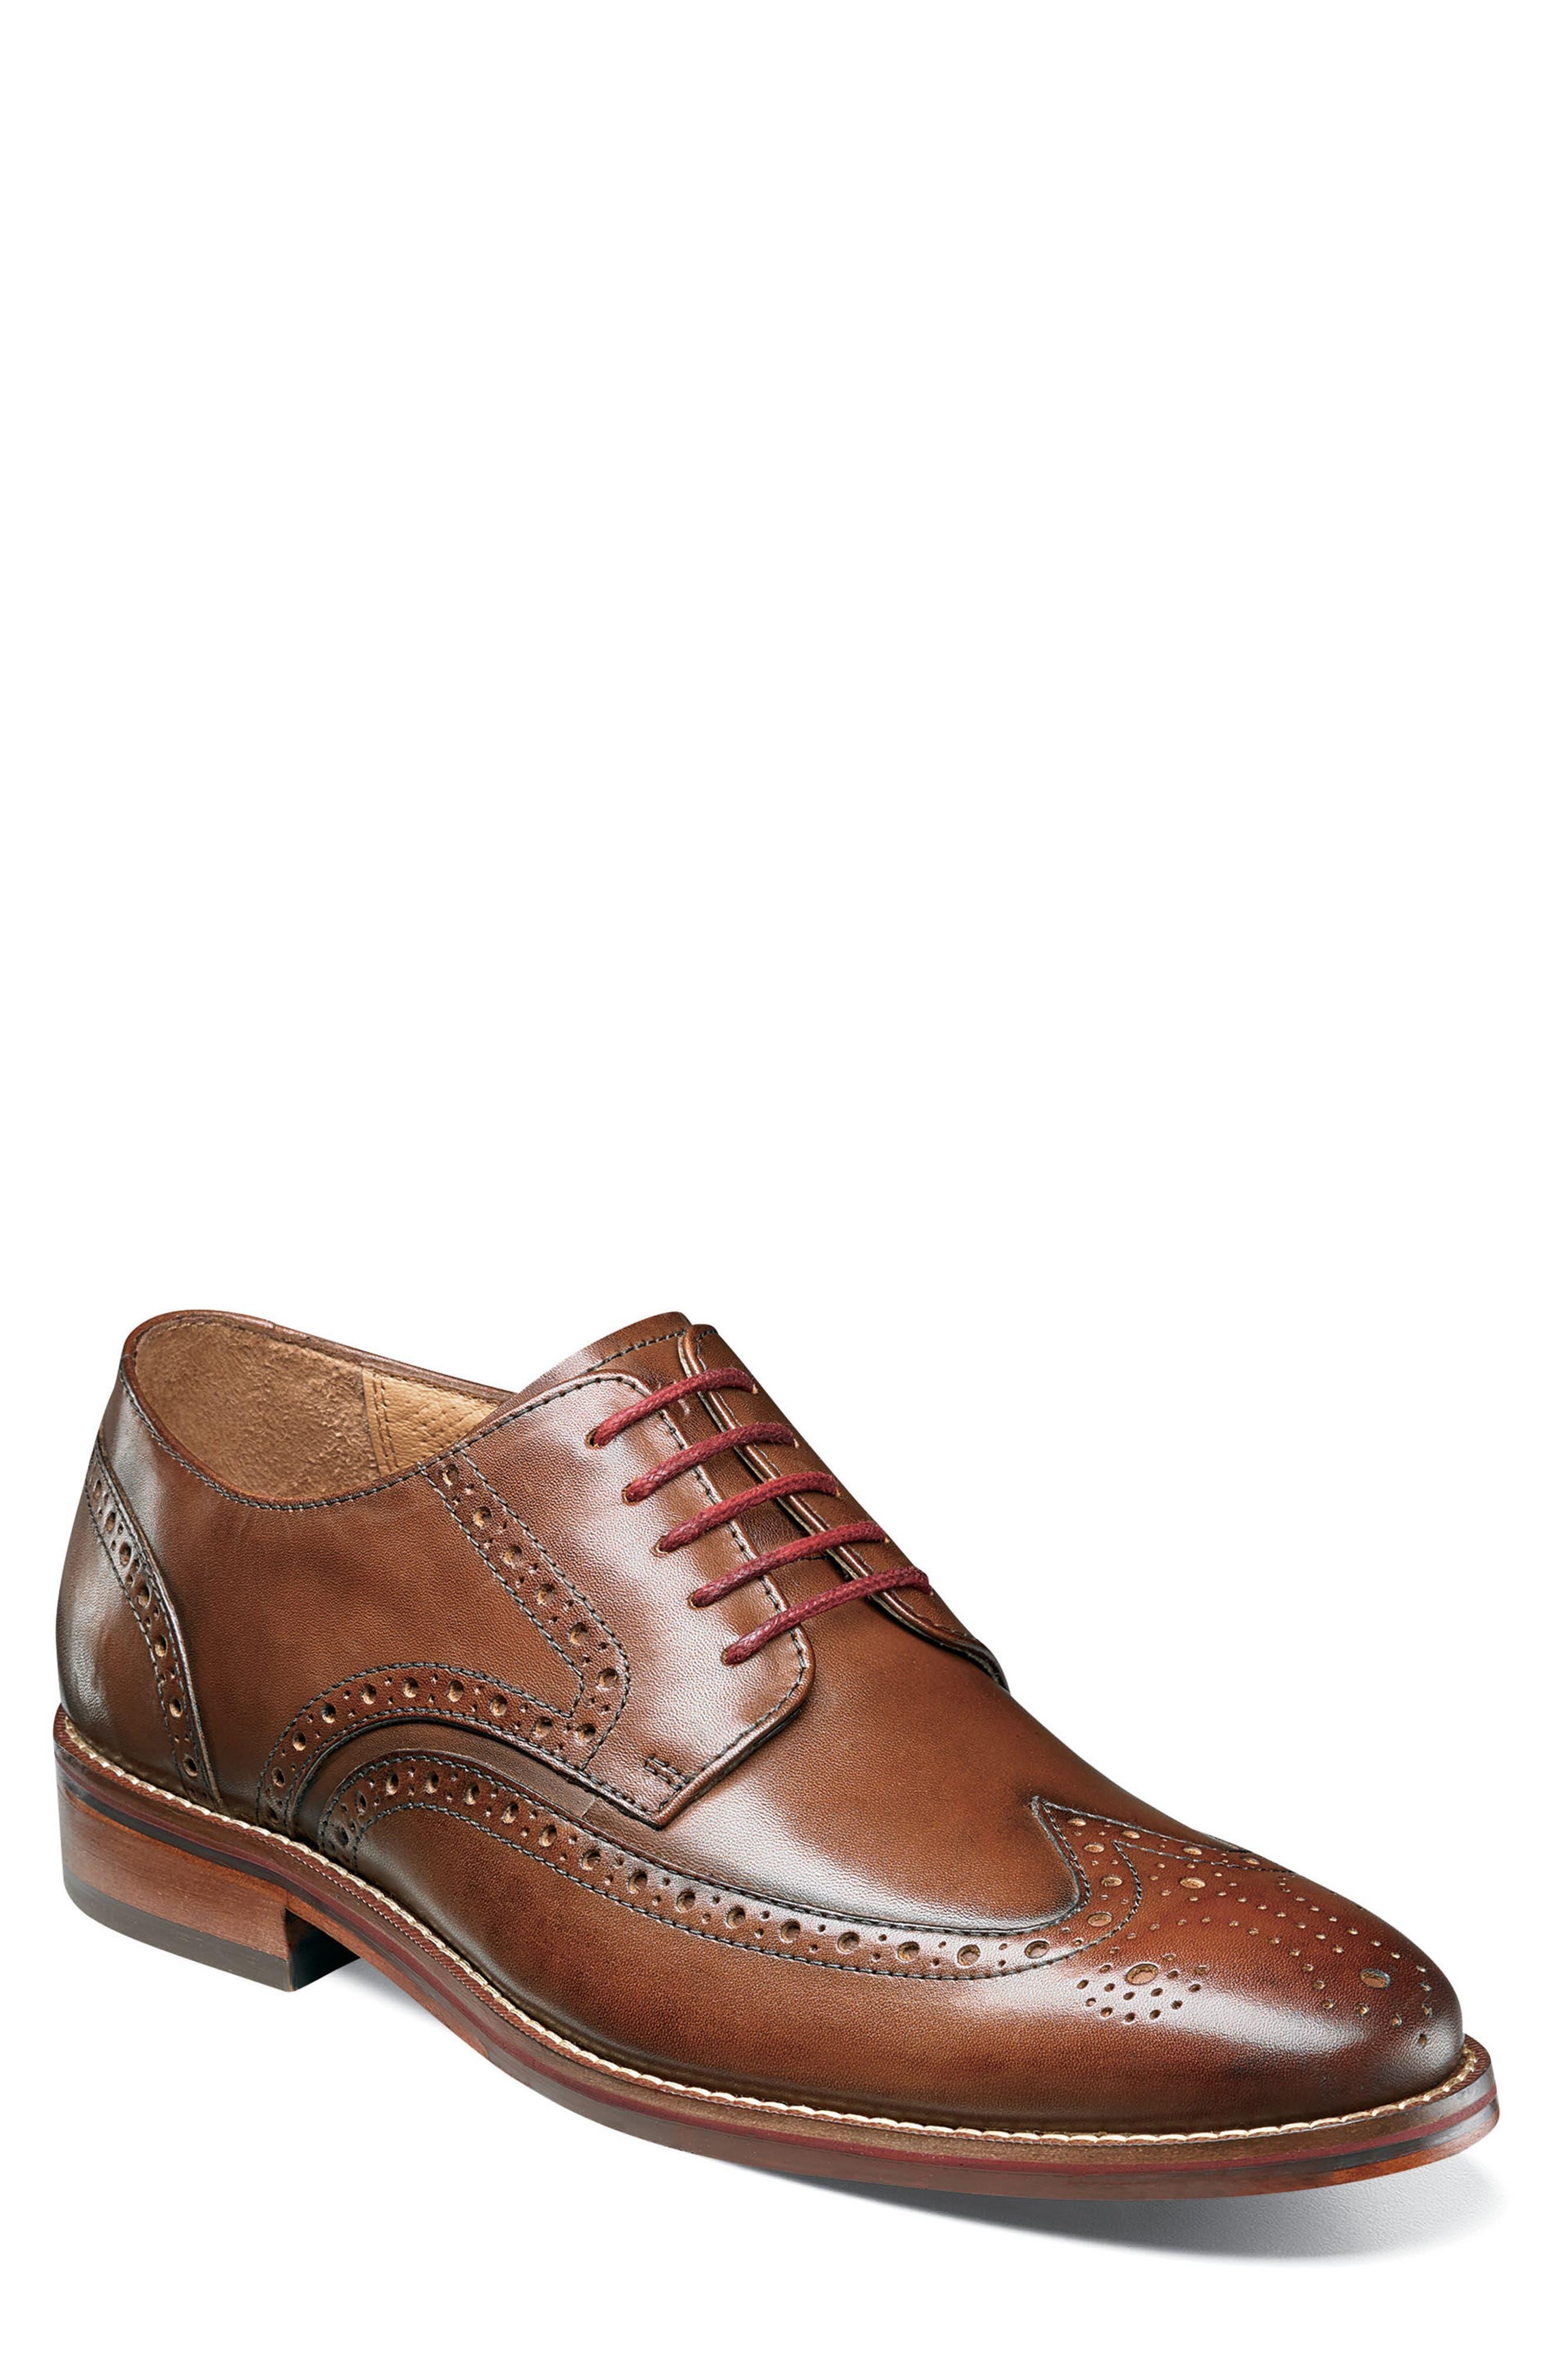 Salerno Wingtip,                         Main,                         color, Cognac Leather